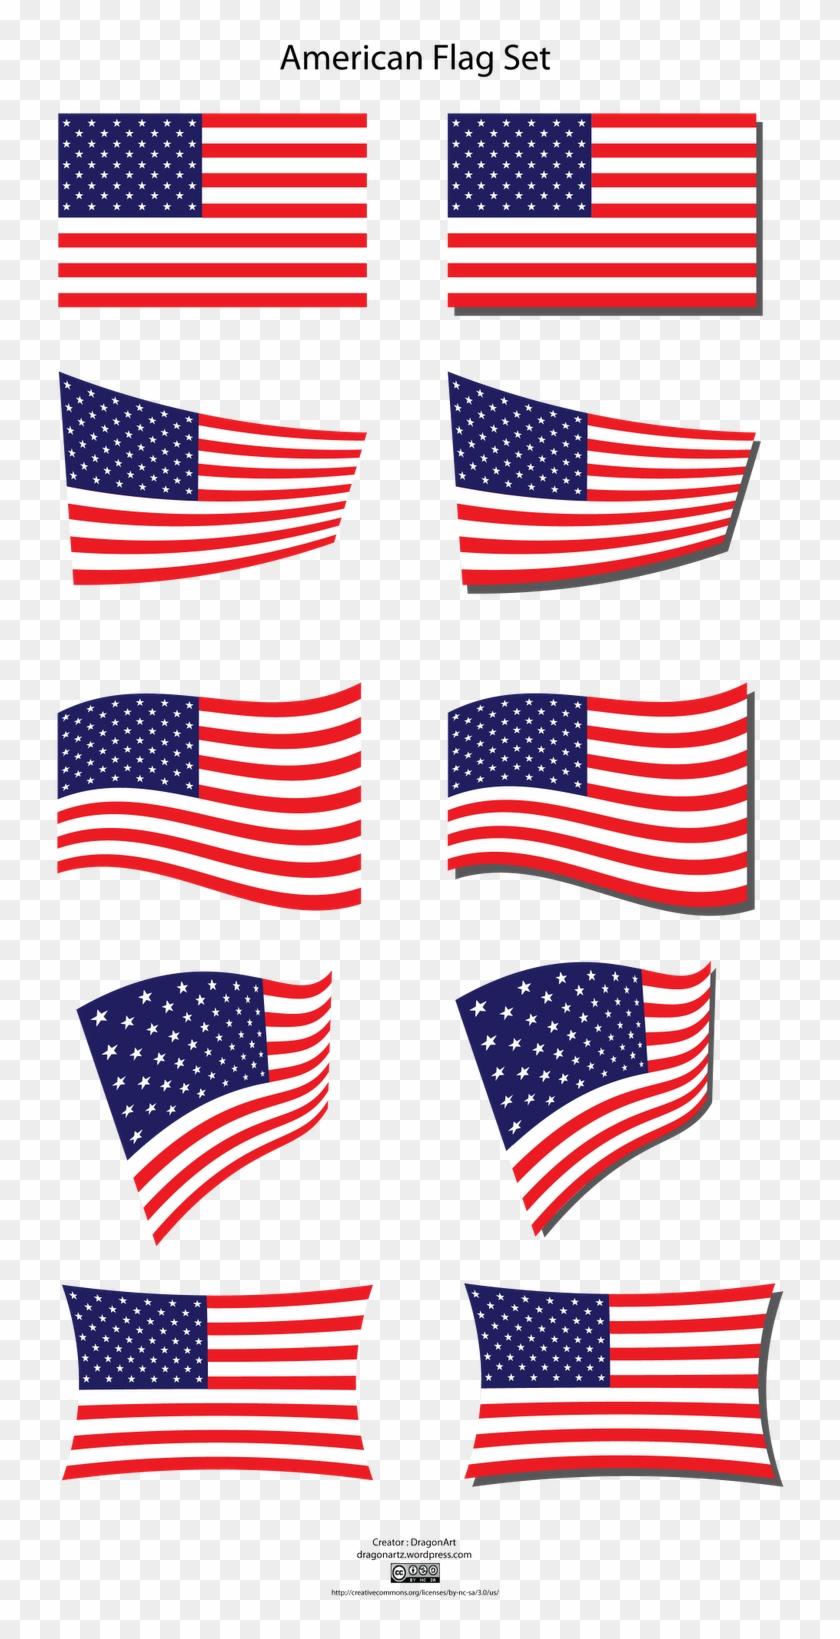 Crossed American Flags Clipart - American Flag #89180